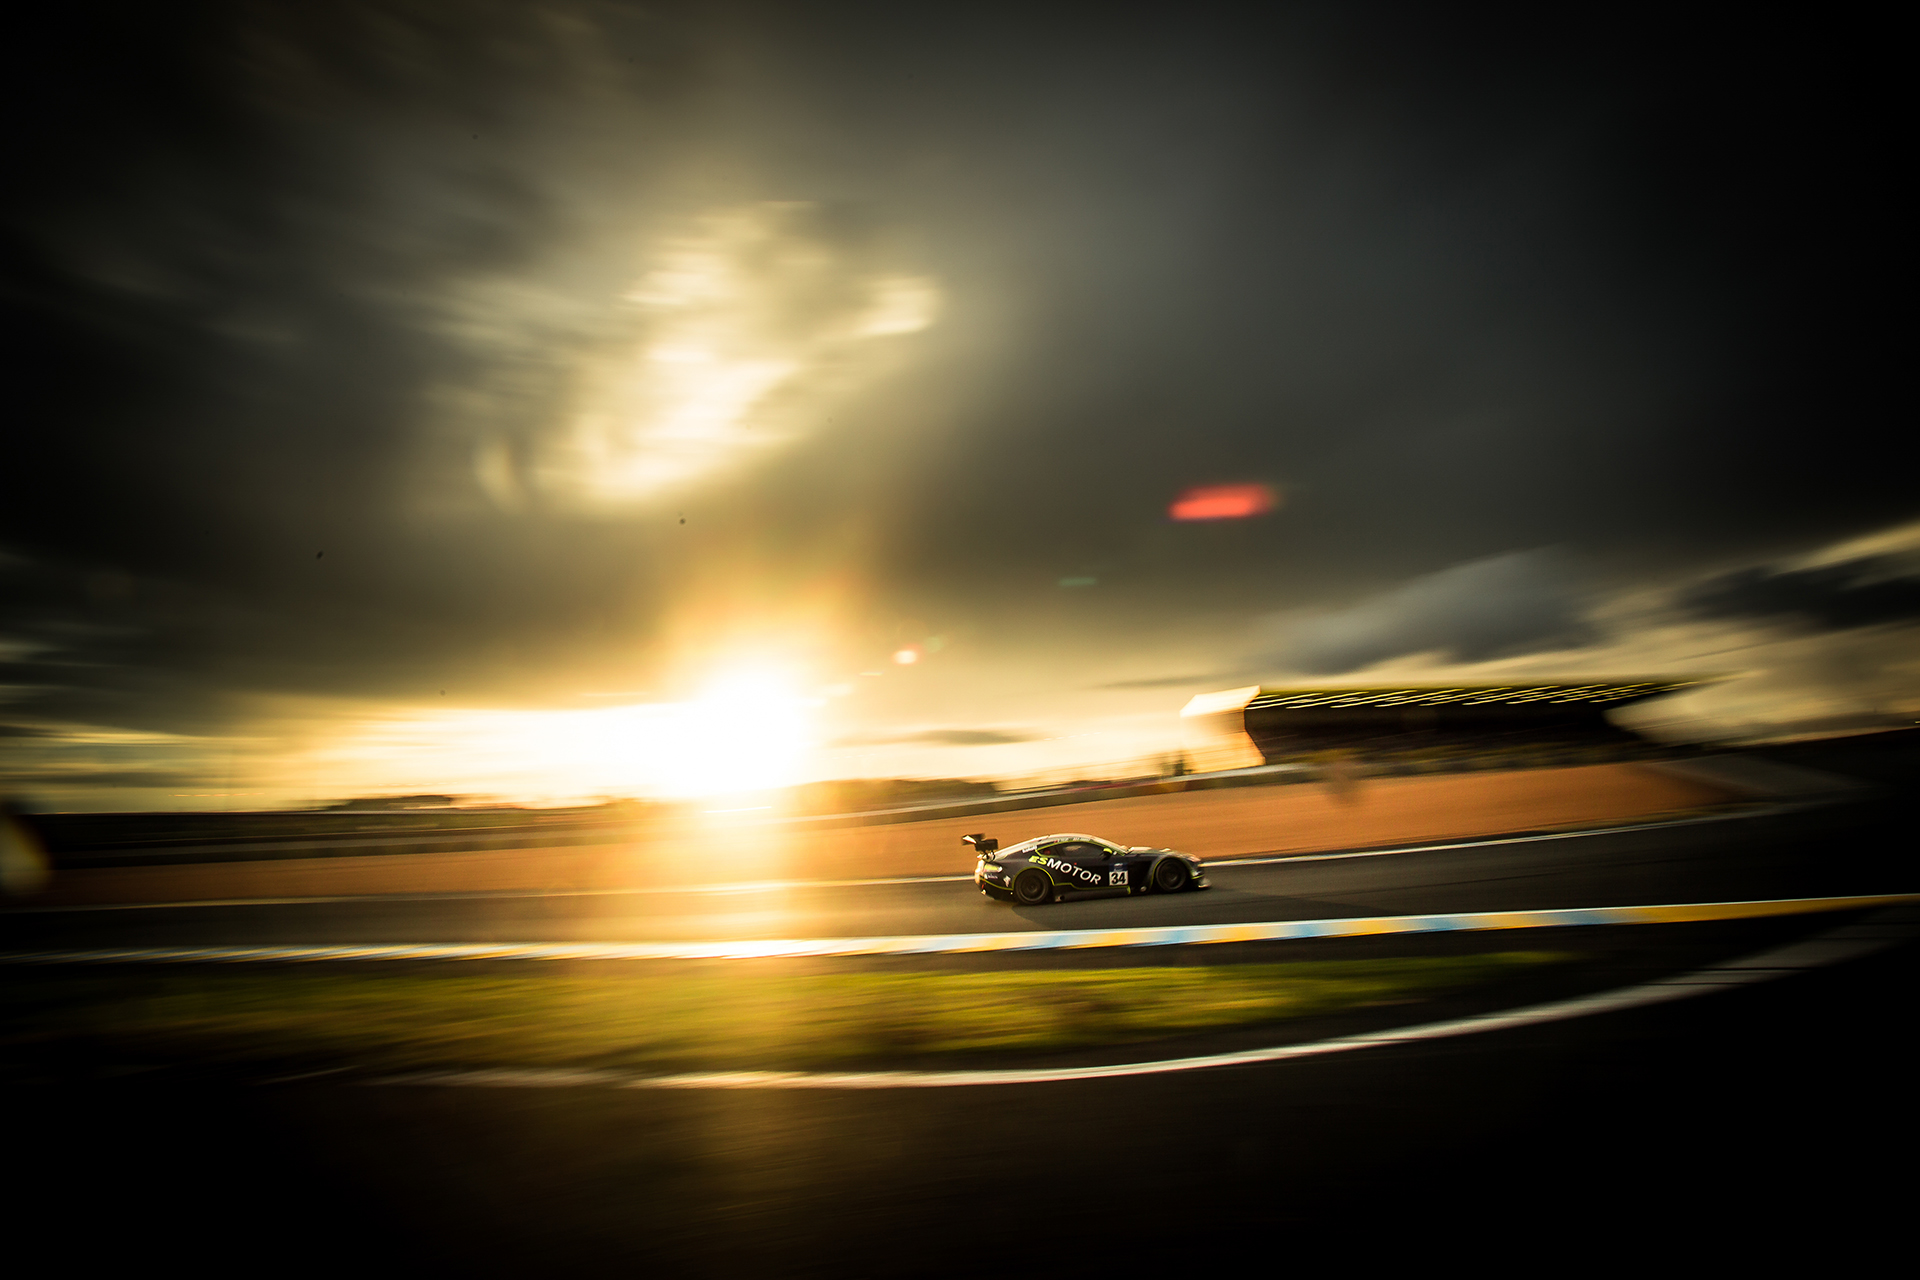 2016-GT3-LeMansCup-RoadToLeMans-55597.jpg